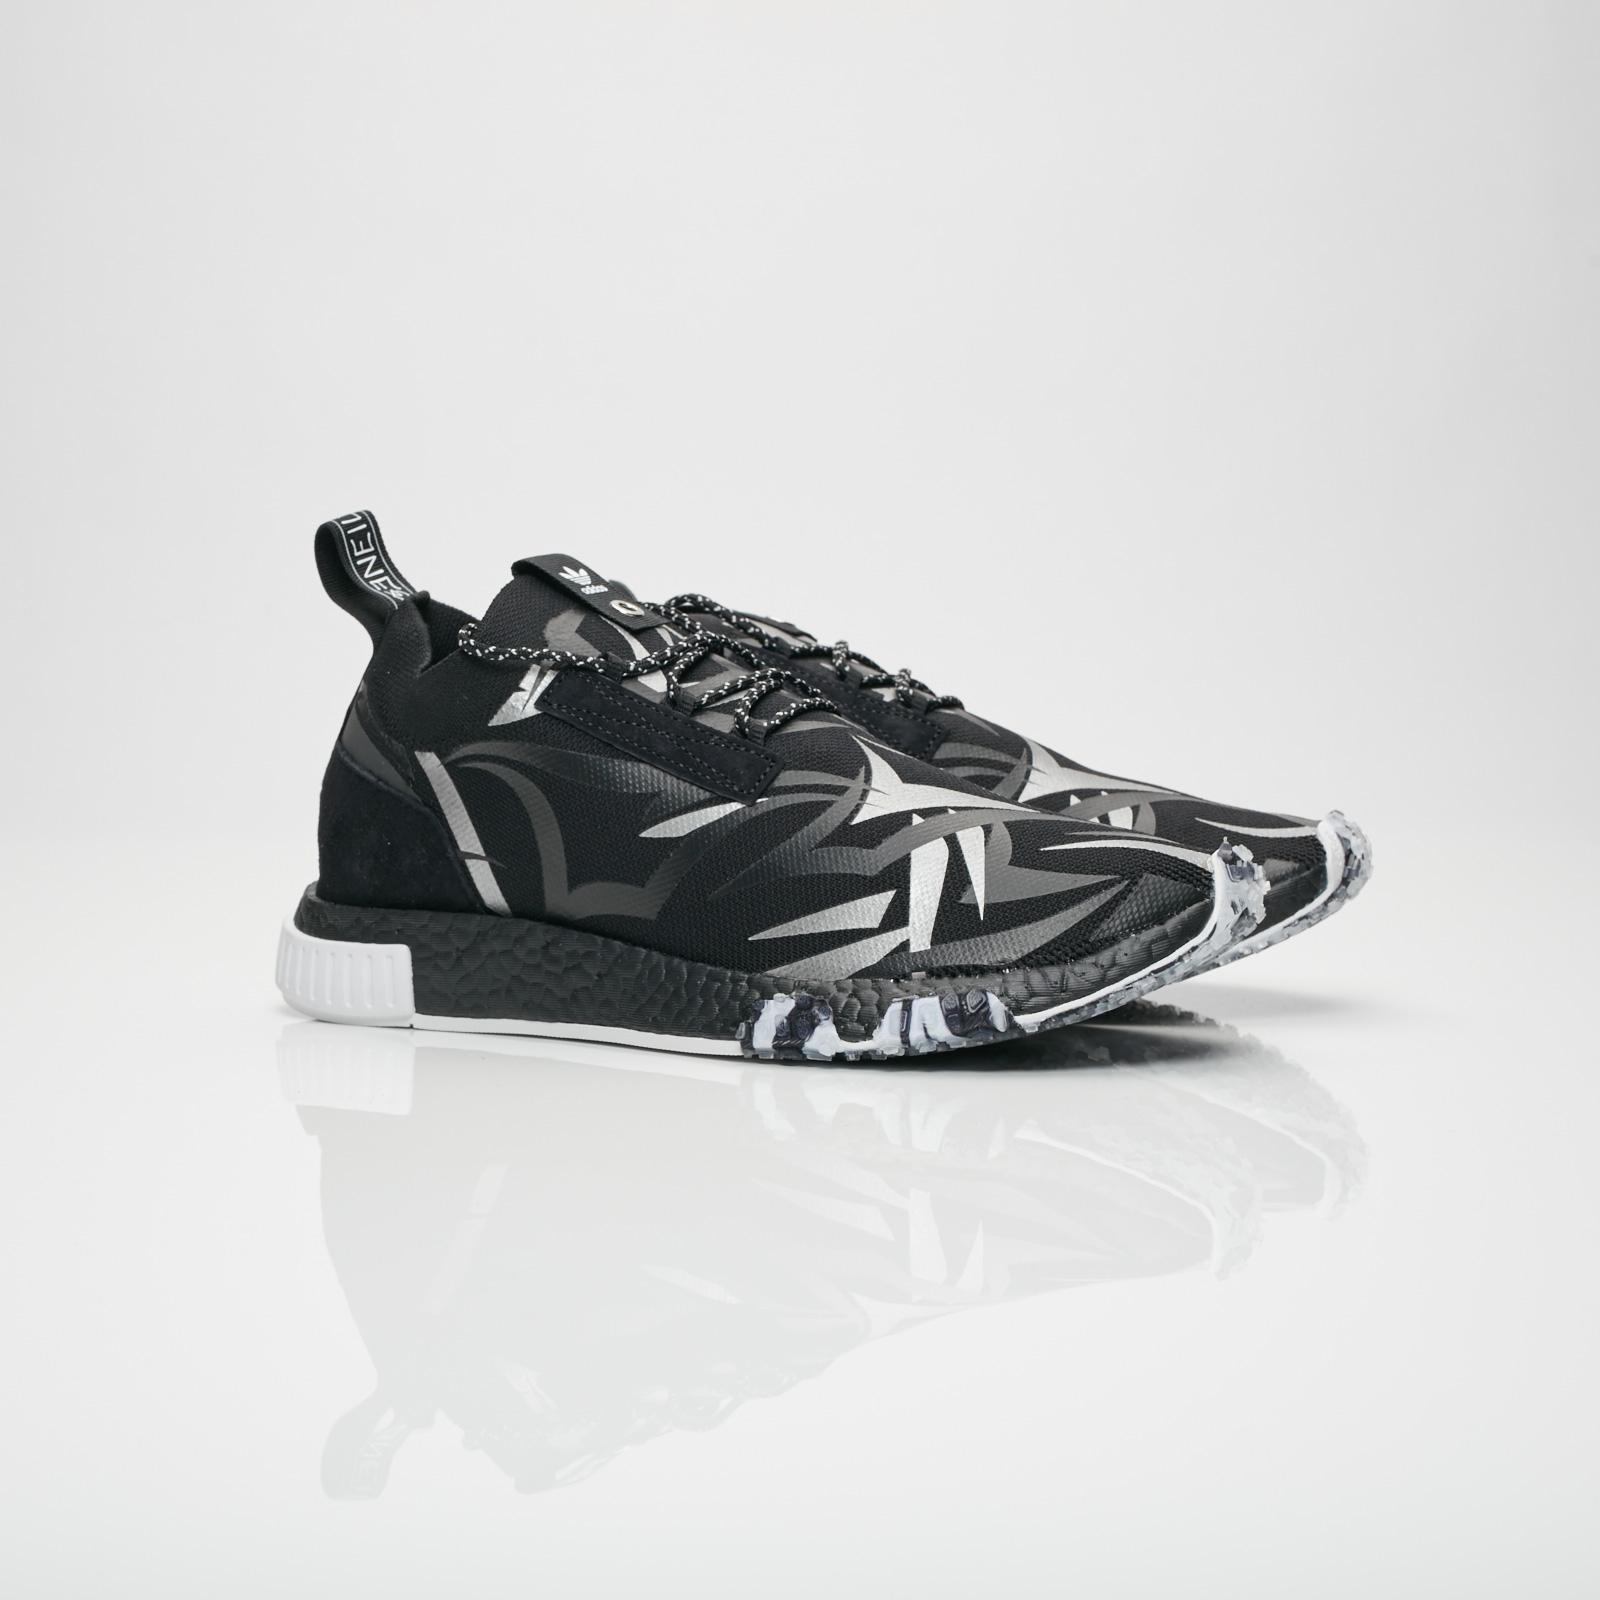 wholesale dealer b1018 fe264 adidas NMD Racer Racer Racer Juice Db1777 Basketsnstuff Baskets 6399ad